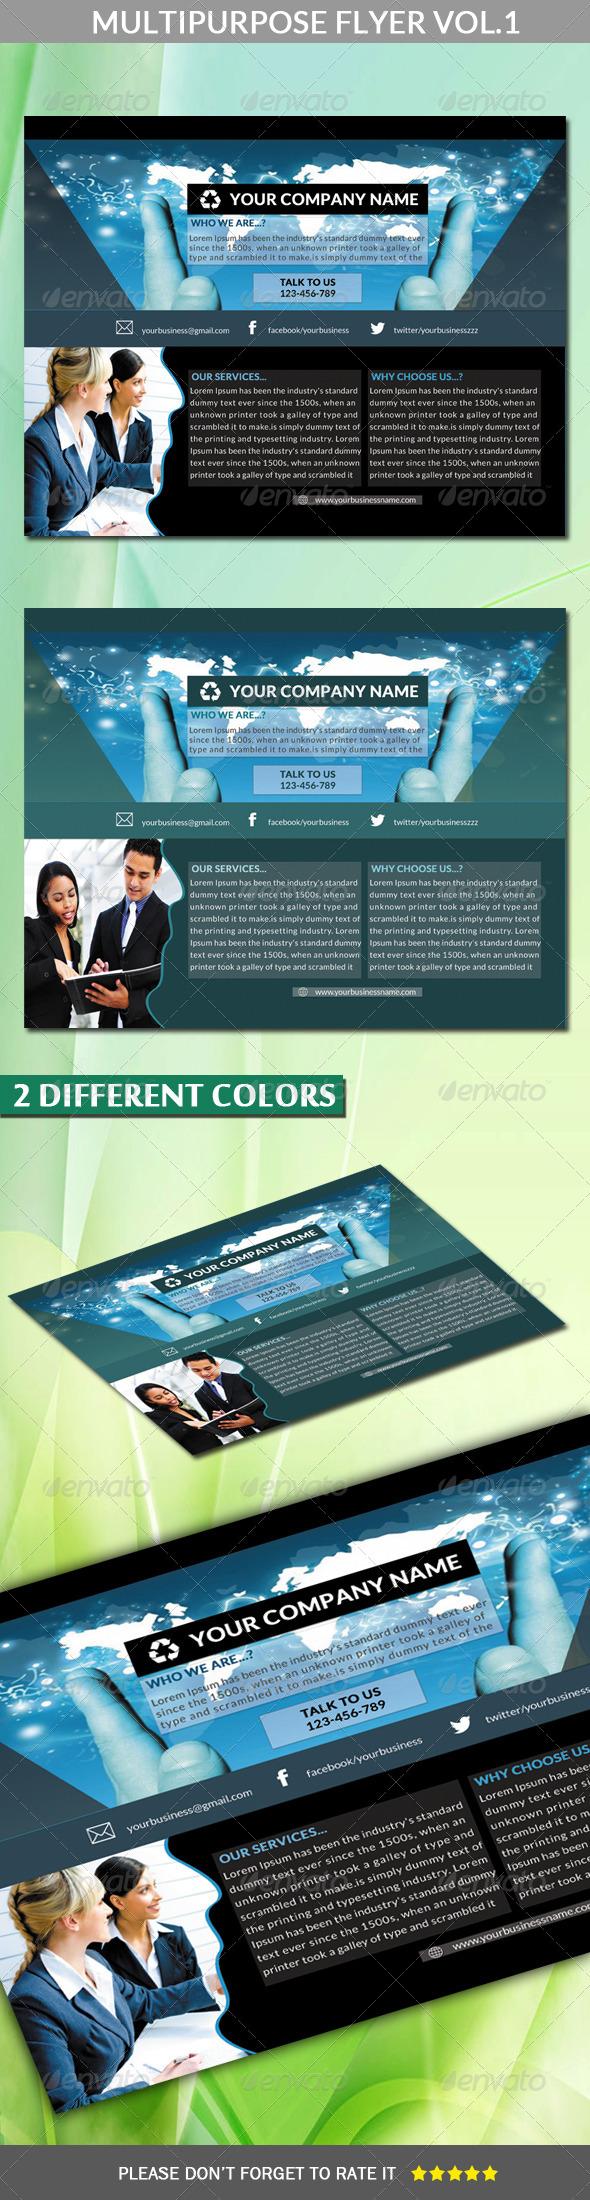 GraphicRiver Multipurpose Flyer Vol.1 Landscape 6294279